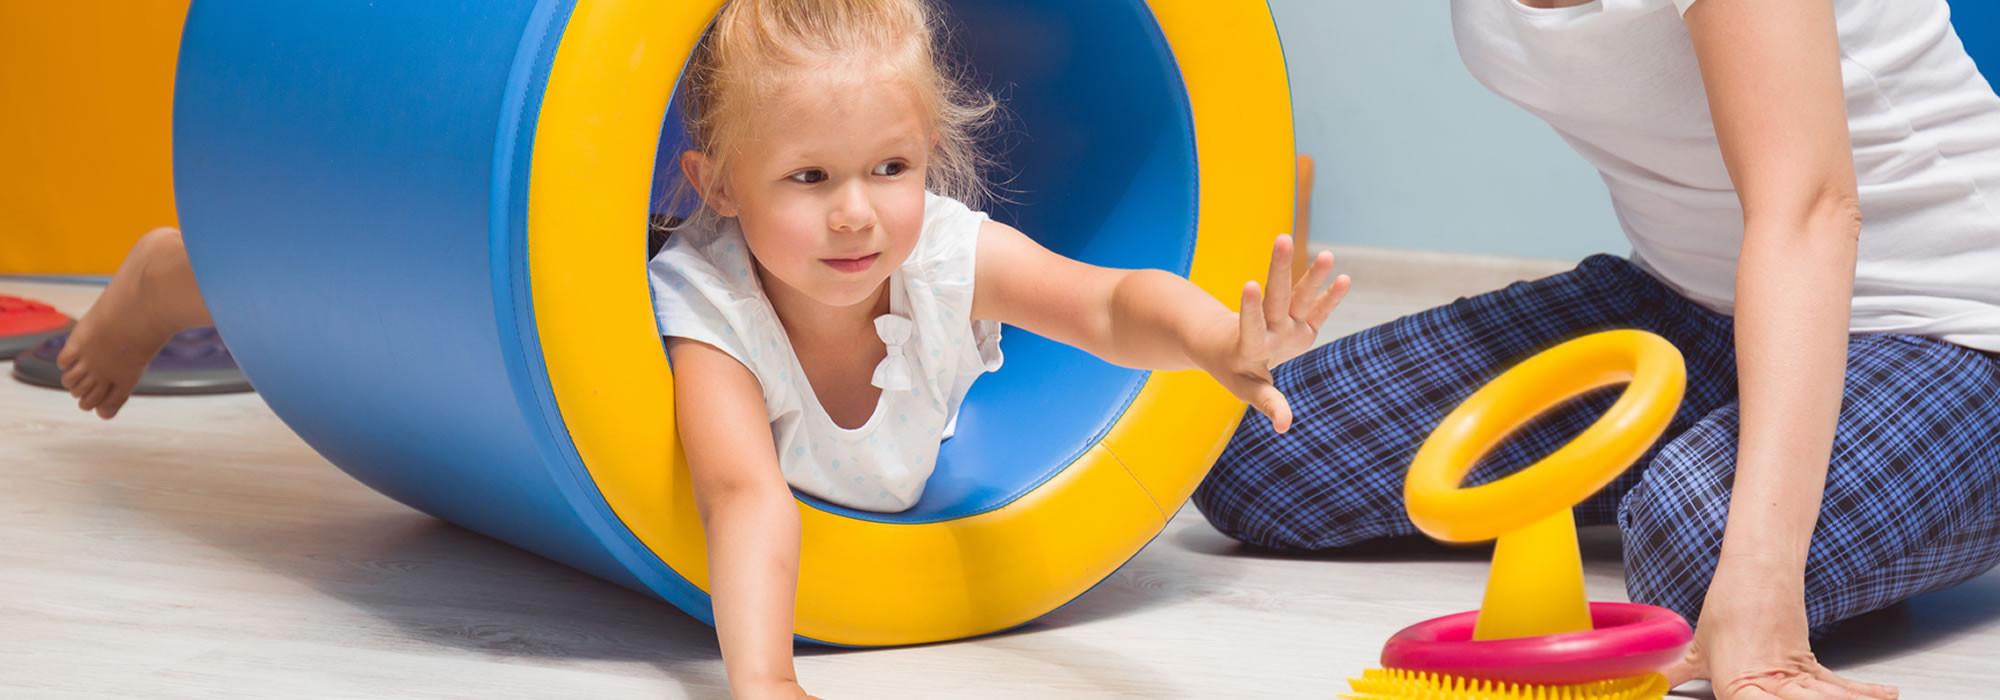 Ergotherapeuten schenken Kindern Freude